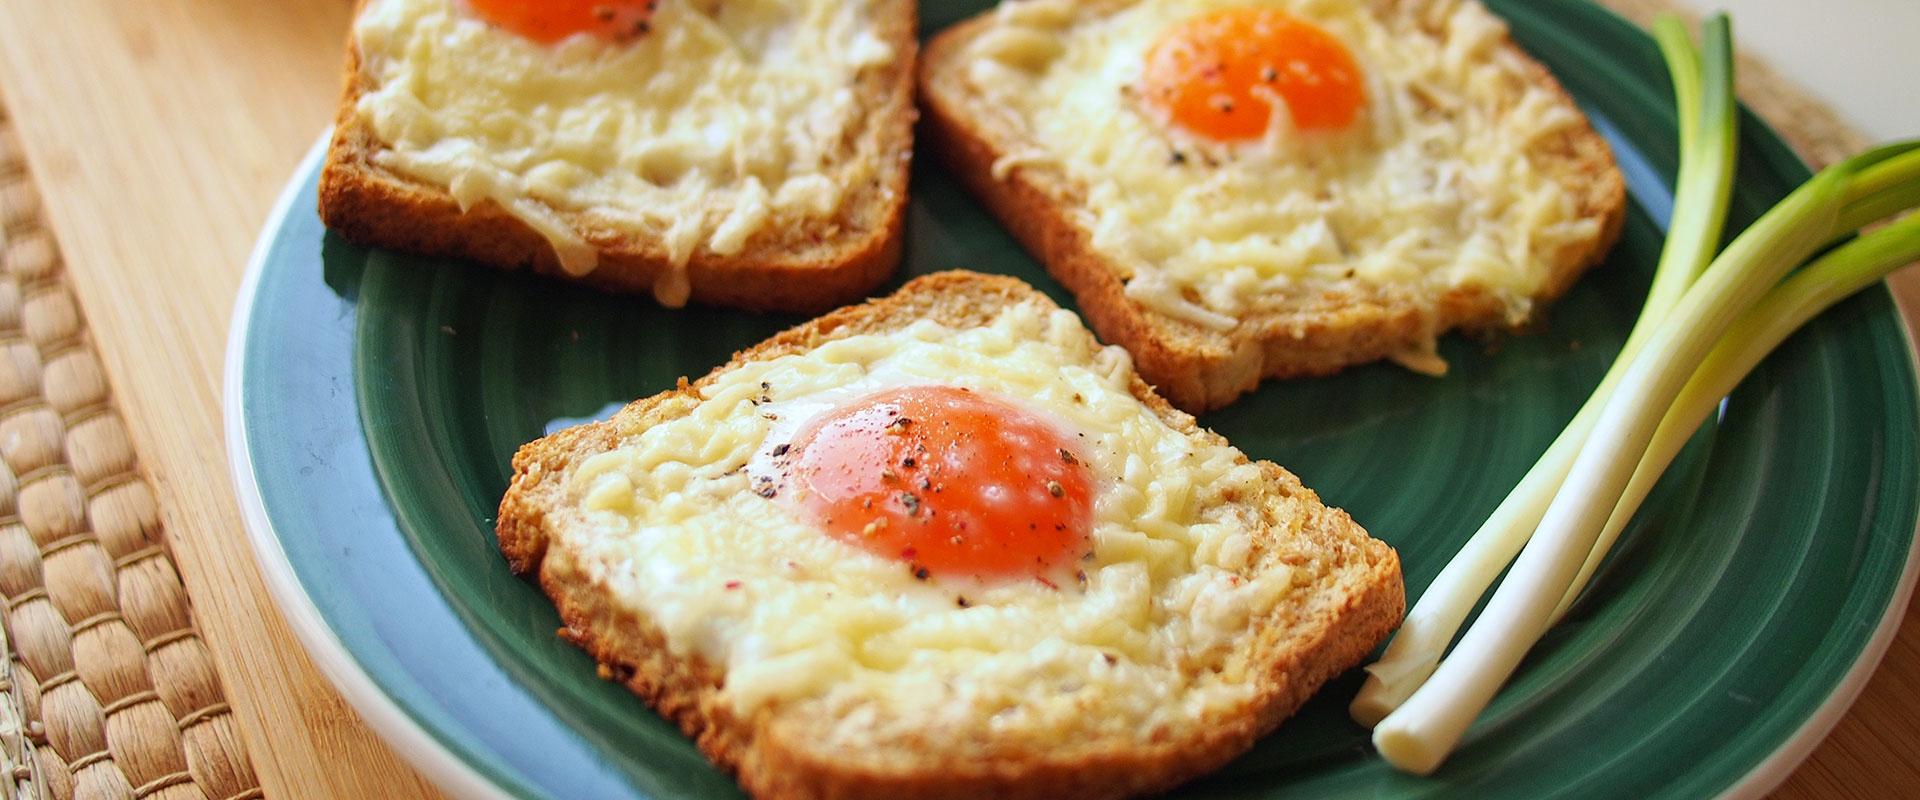 tojásostoast